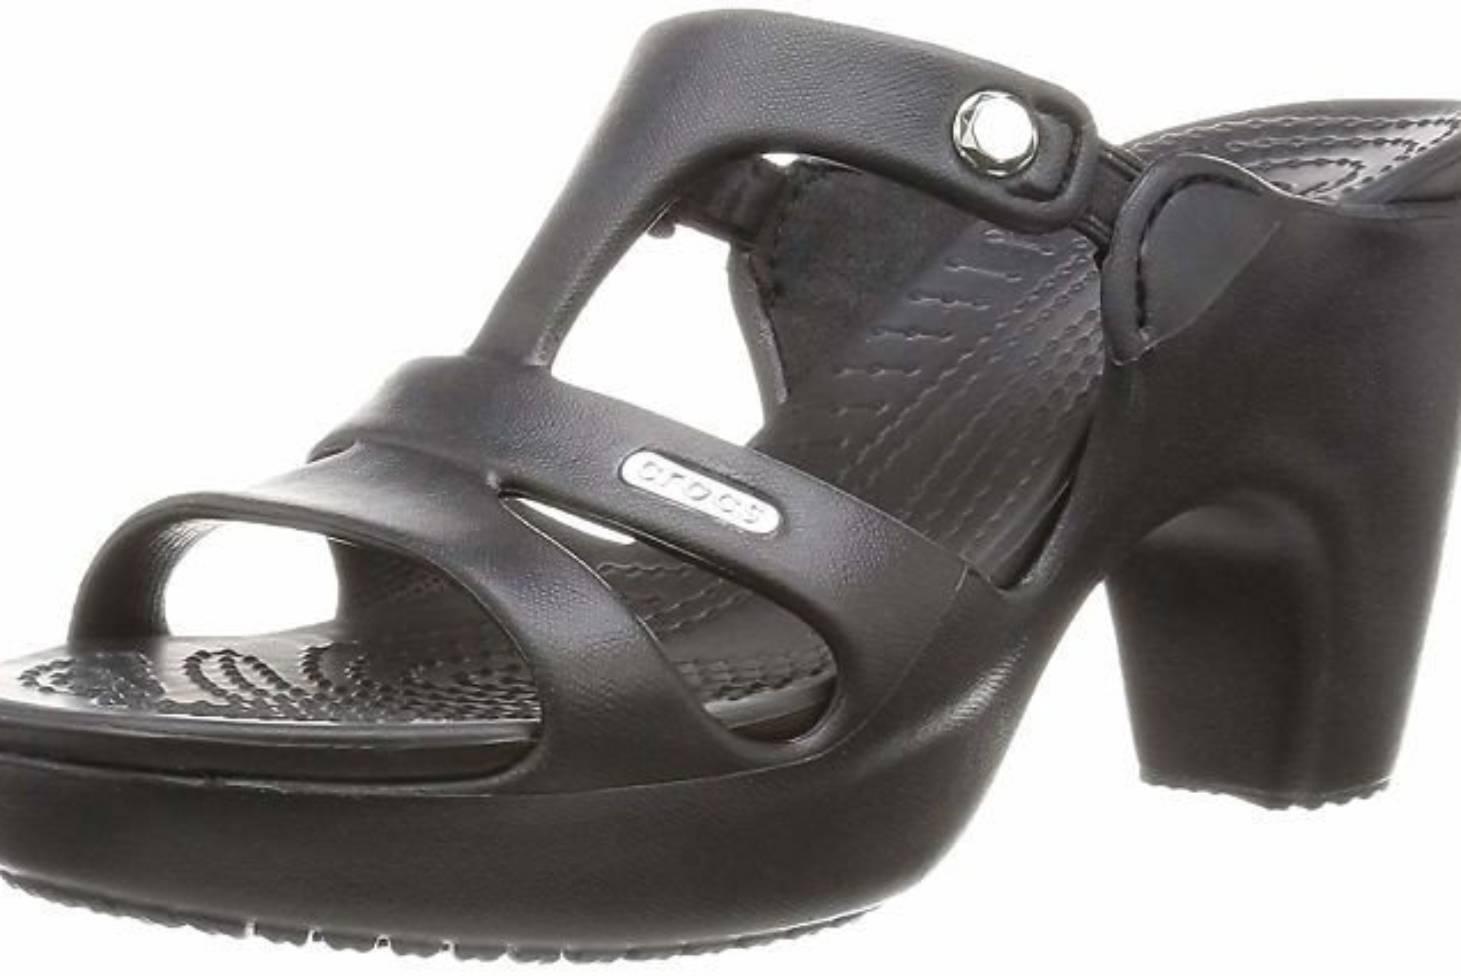 87e3b2338 Crocs can t keep its ugly foam high-heeled sandal in stock